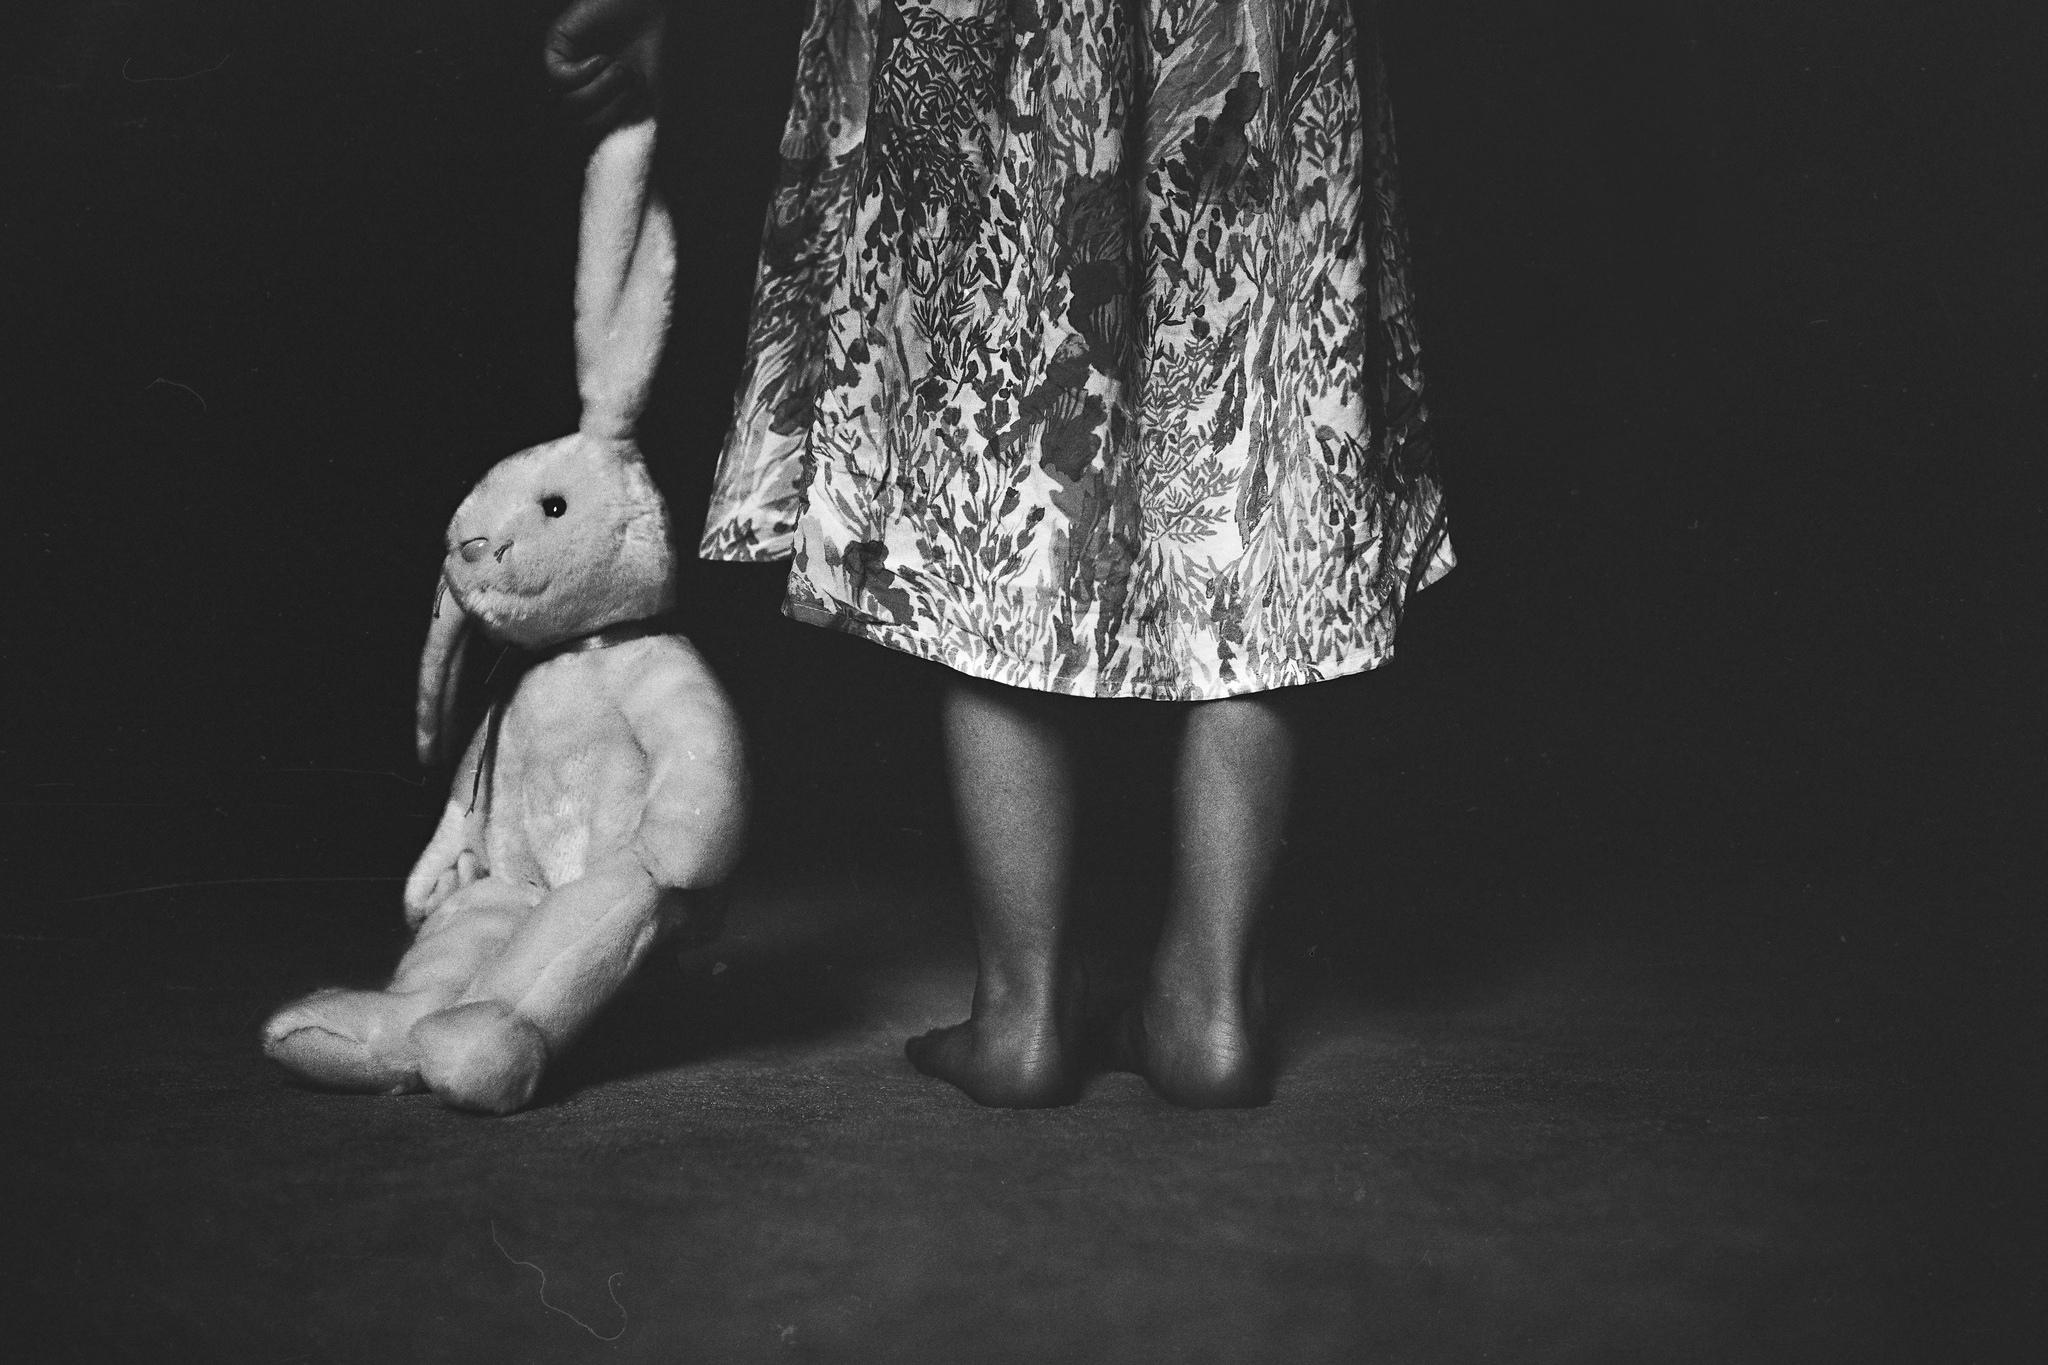 hello-olivia-photography-family-photojournalism-365-tutorial-documenting-bedtime-rituals-lowlight-kids-documentary-and lifestyle-photographer-long-island-new-york6.jpg